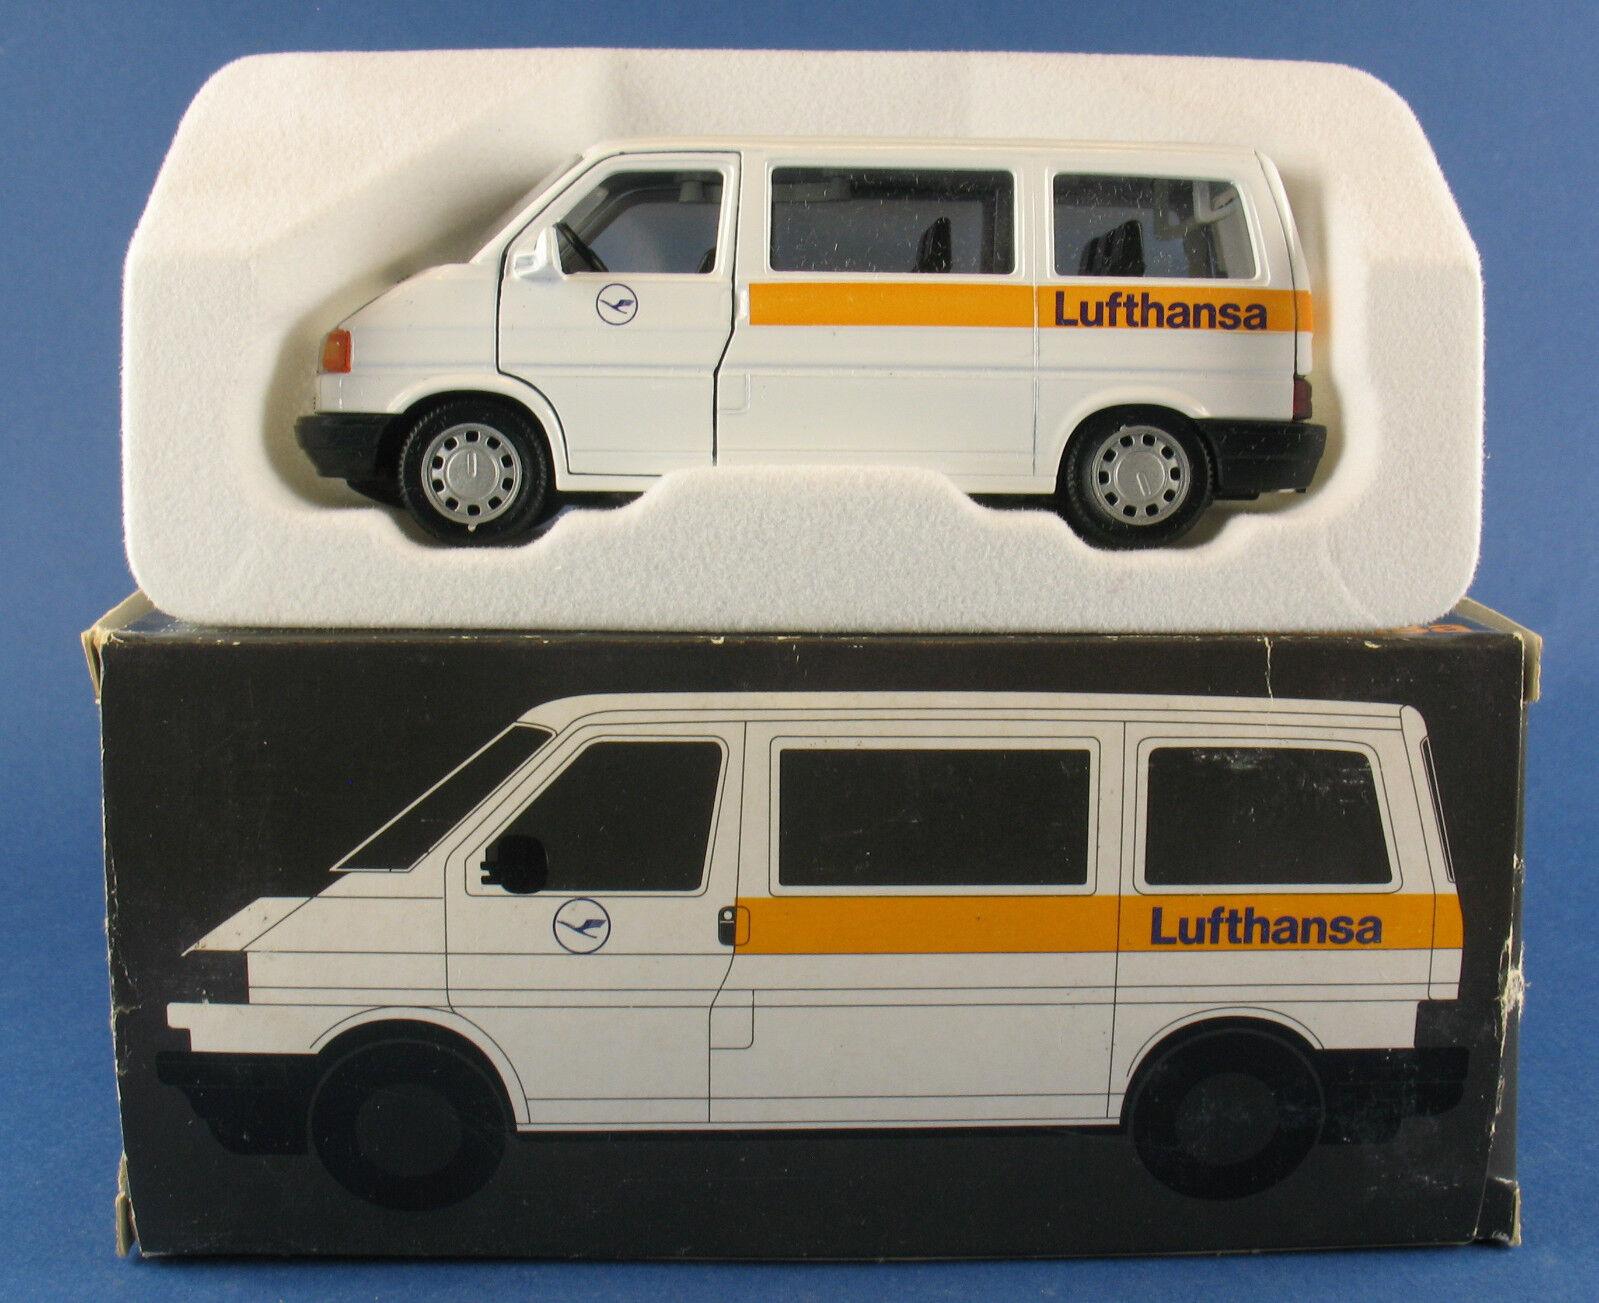 SCHABAK 1060 - Volkswagen VW Bus T4 Caravelle - Lufthansa - 1 43 - in OVP